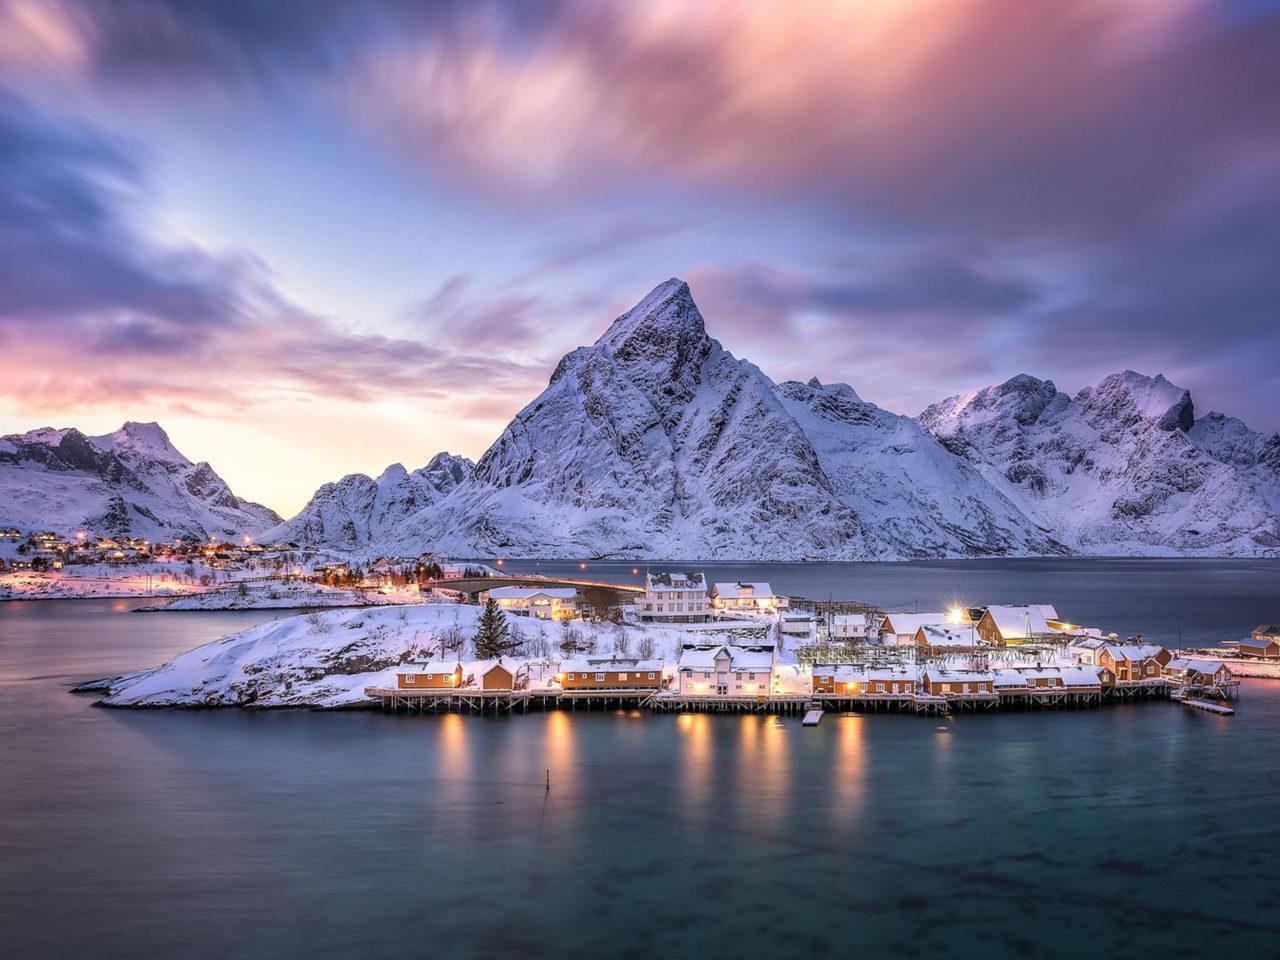 Red Wallpaper Hd Download Norway Islands Lofoten Archipelago Norway Reine Landscape